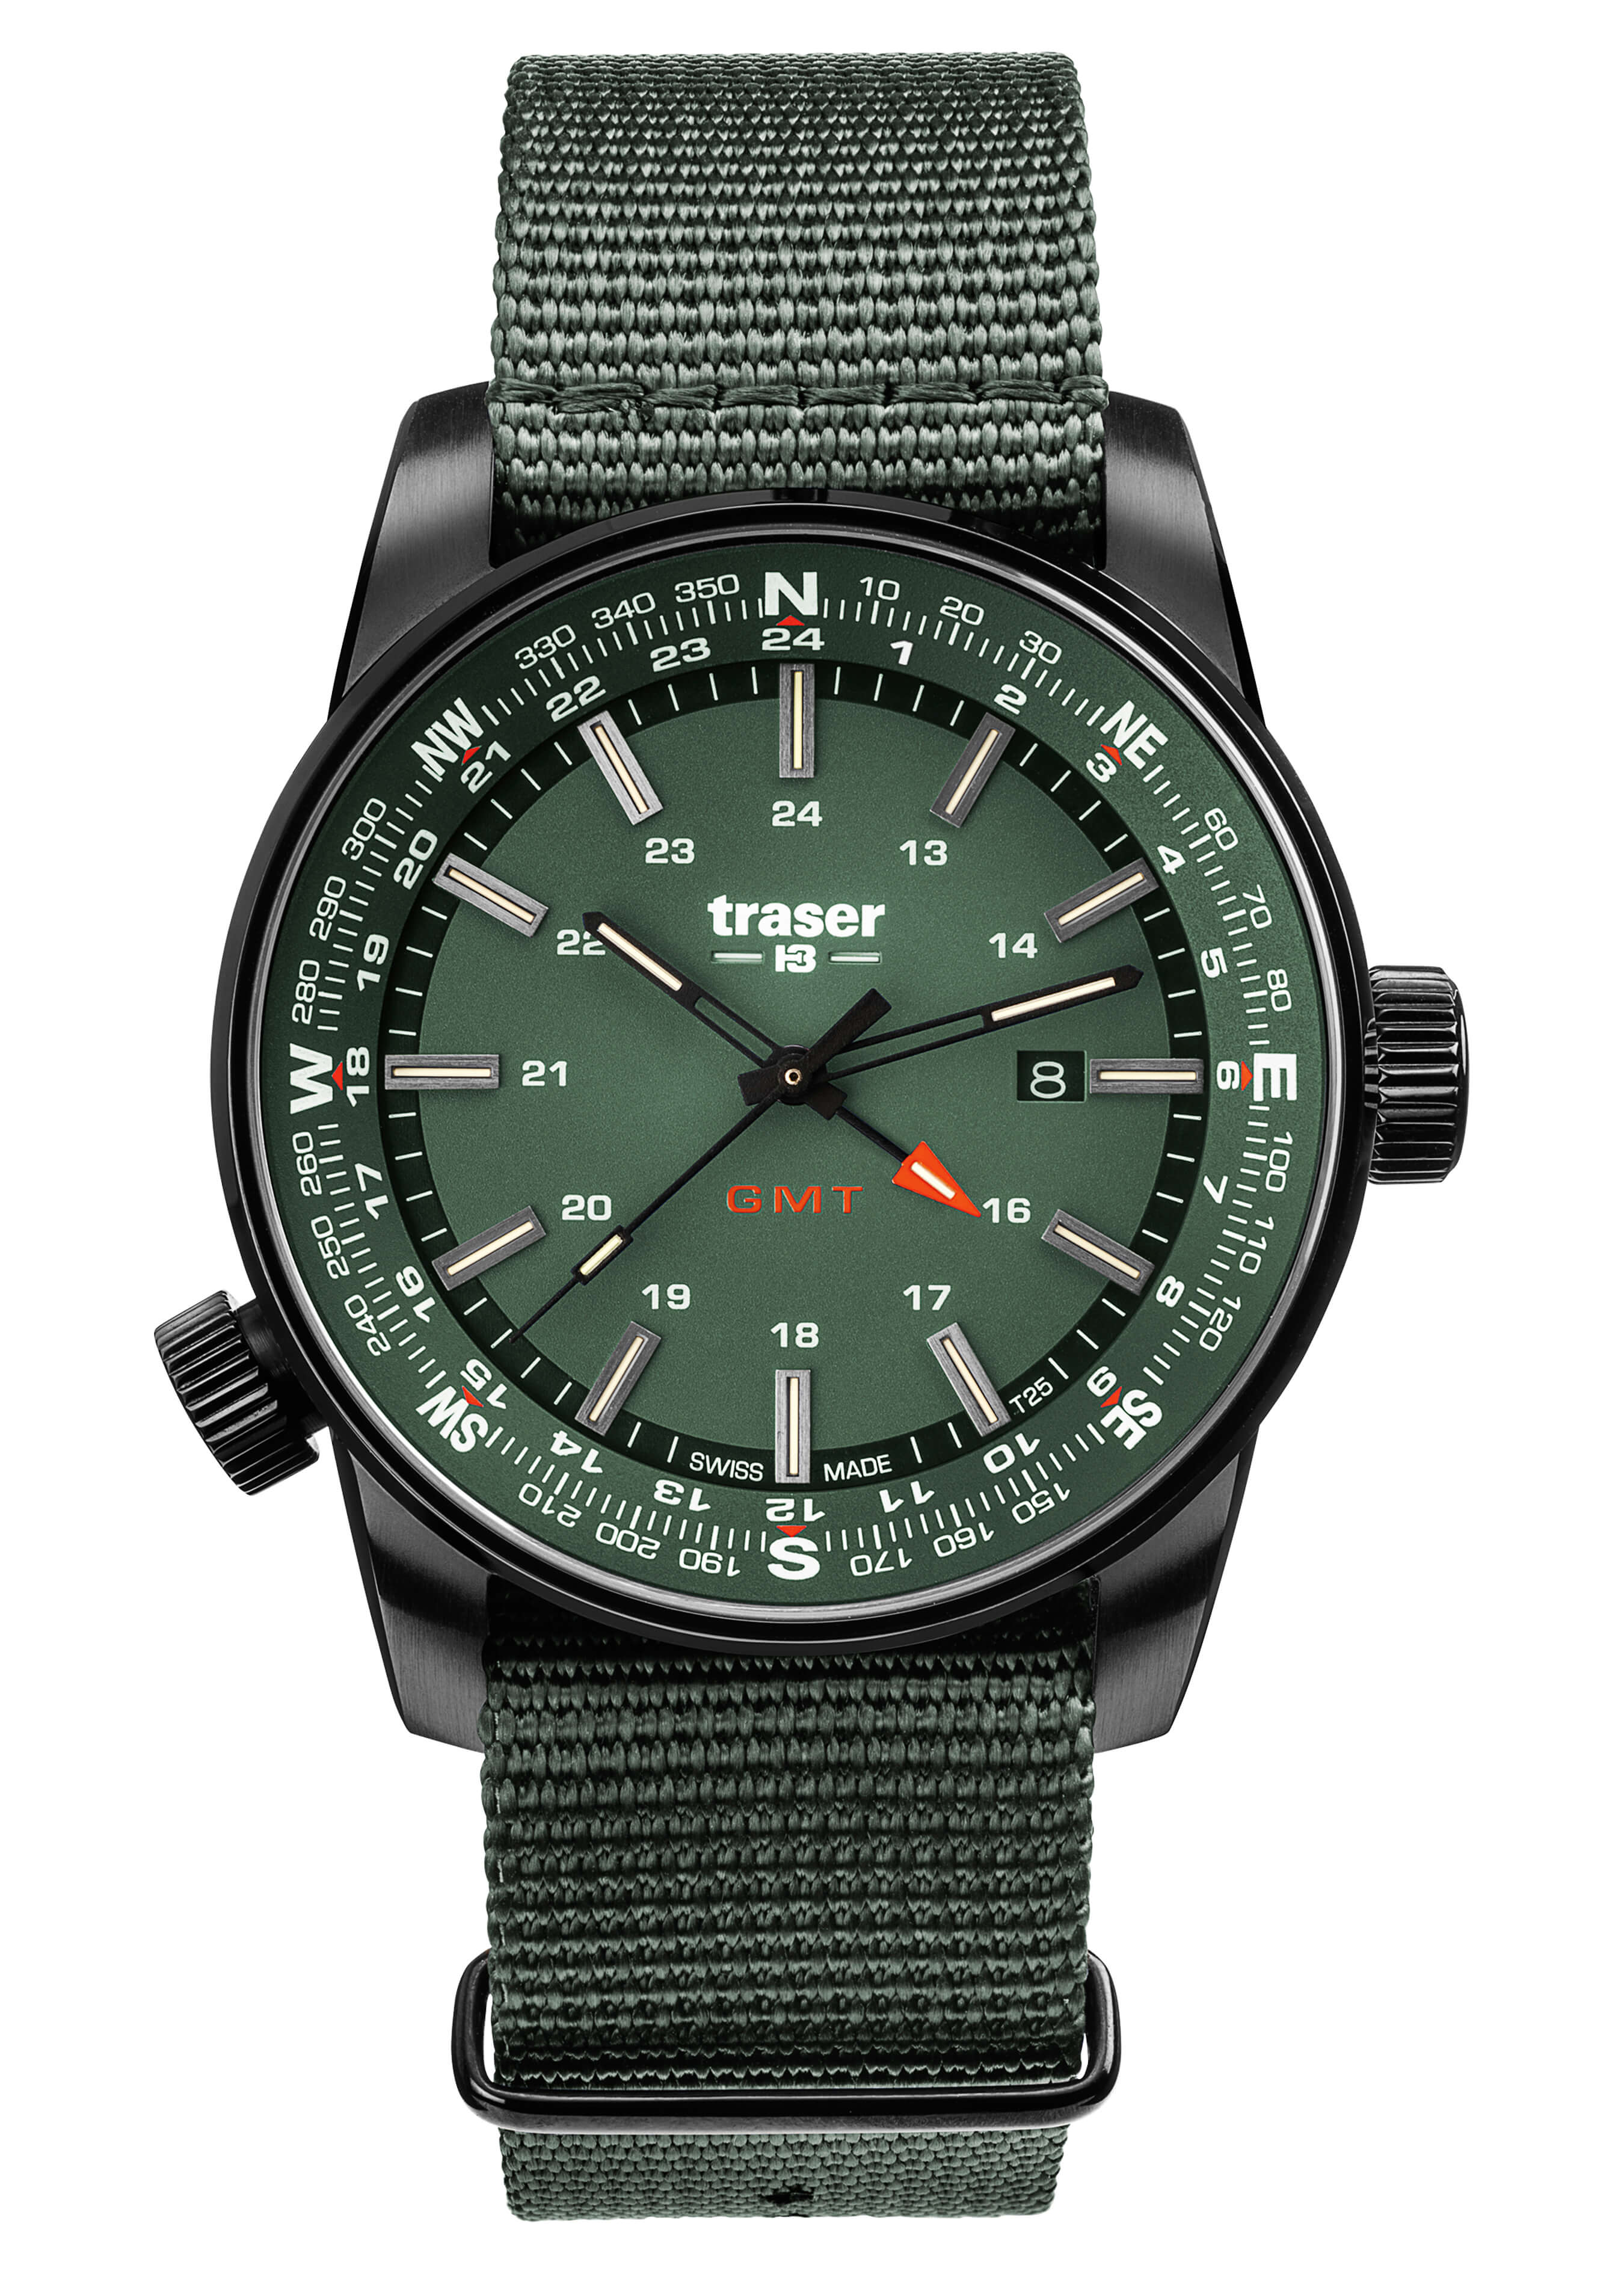 Montre bracelet P68 Pathfinder 262626 1